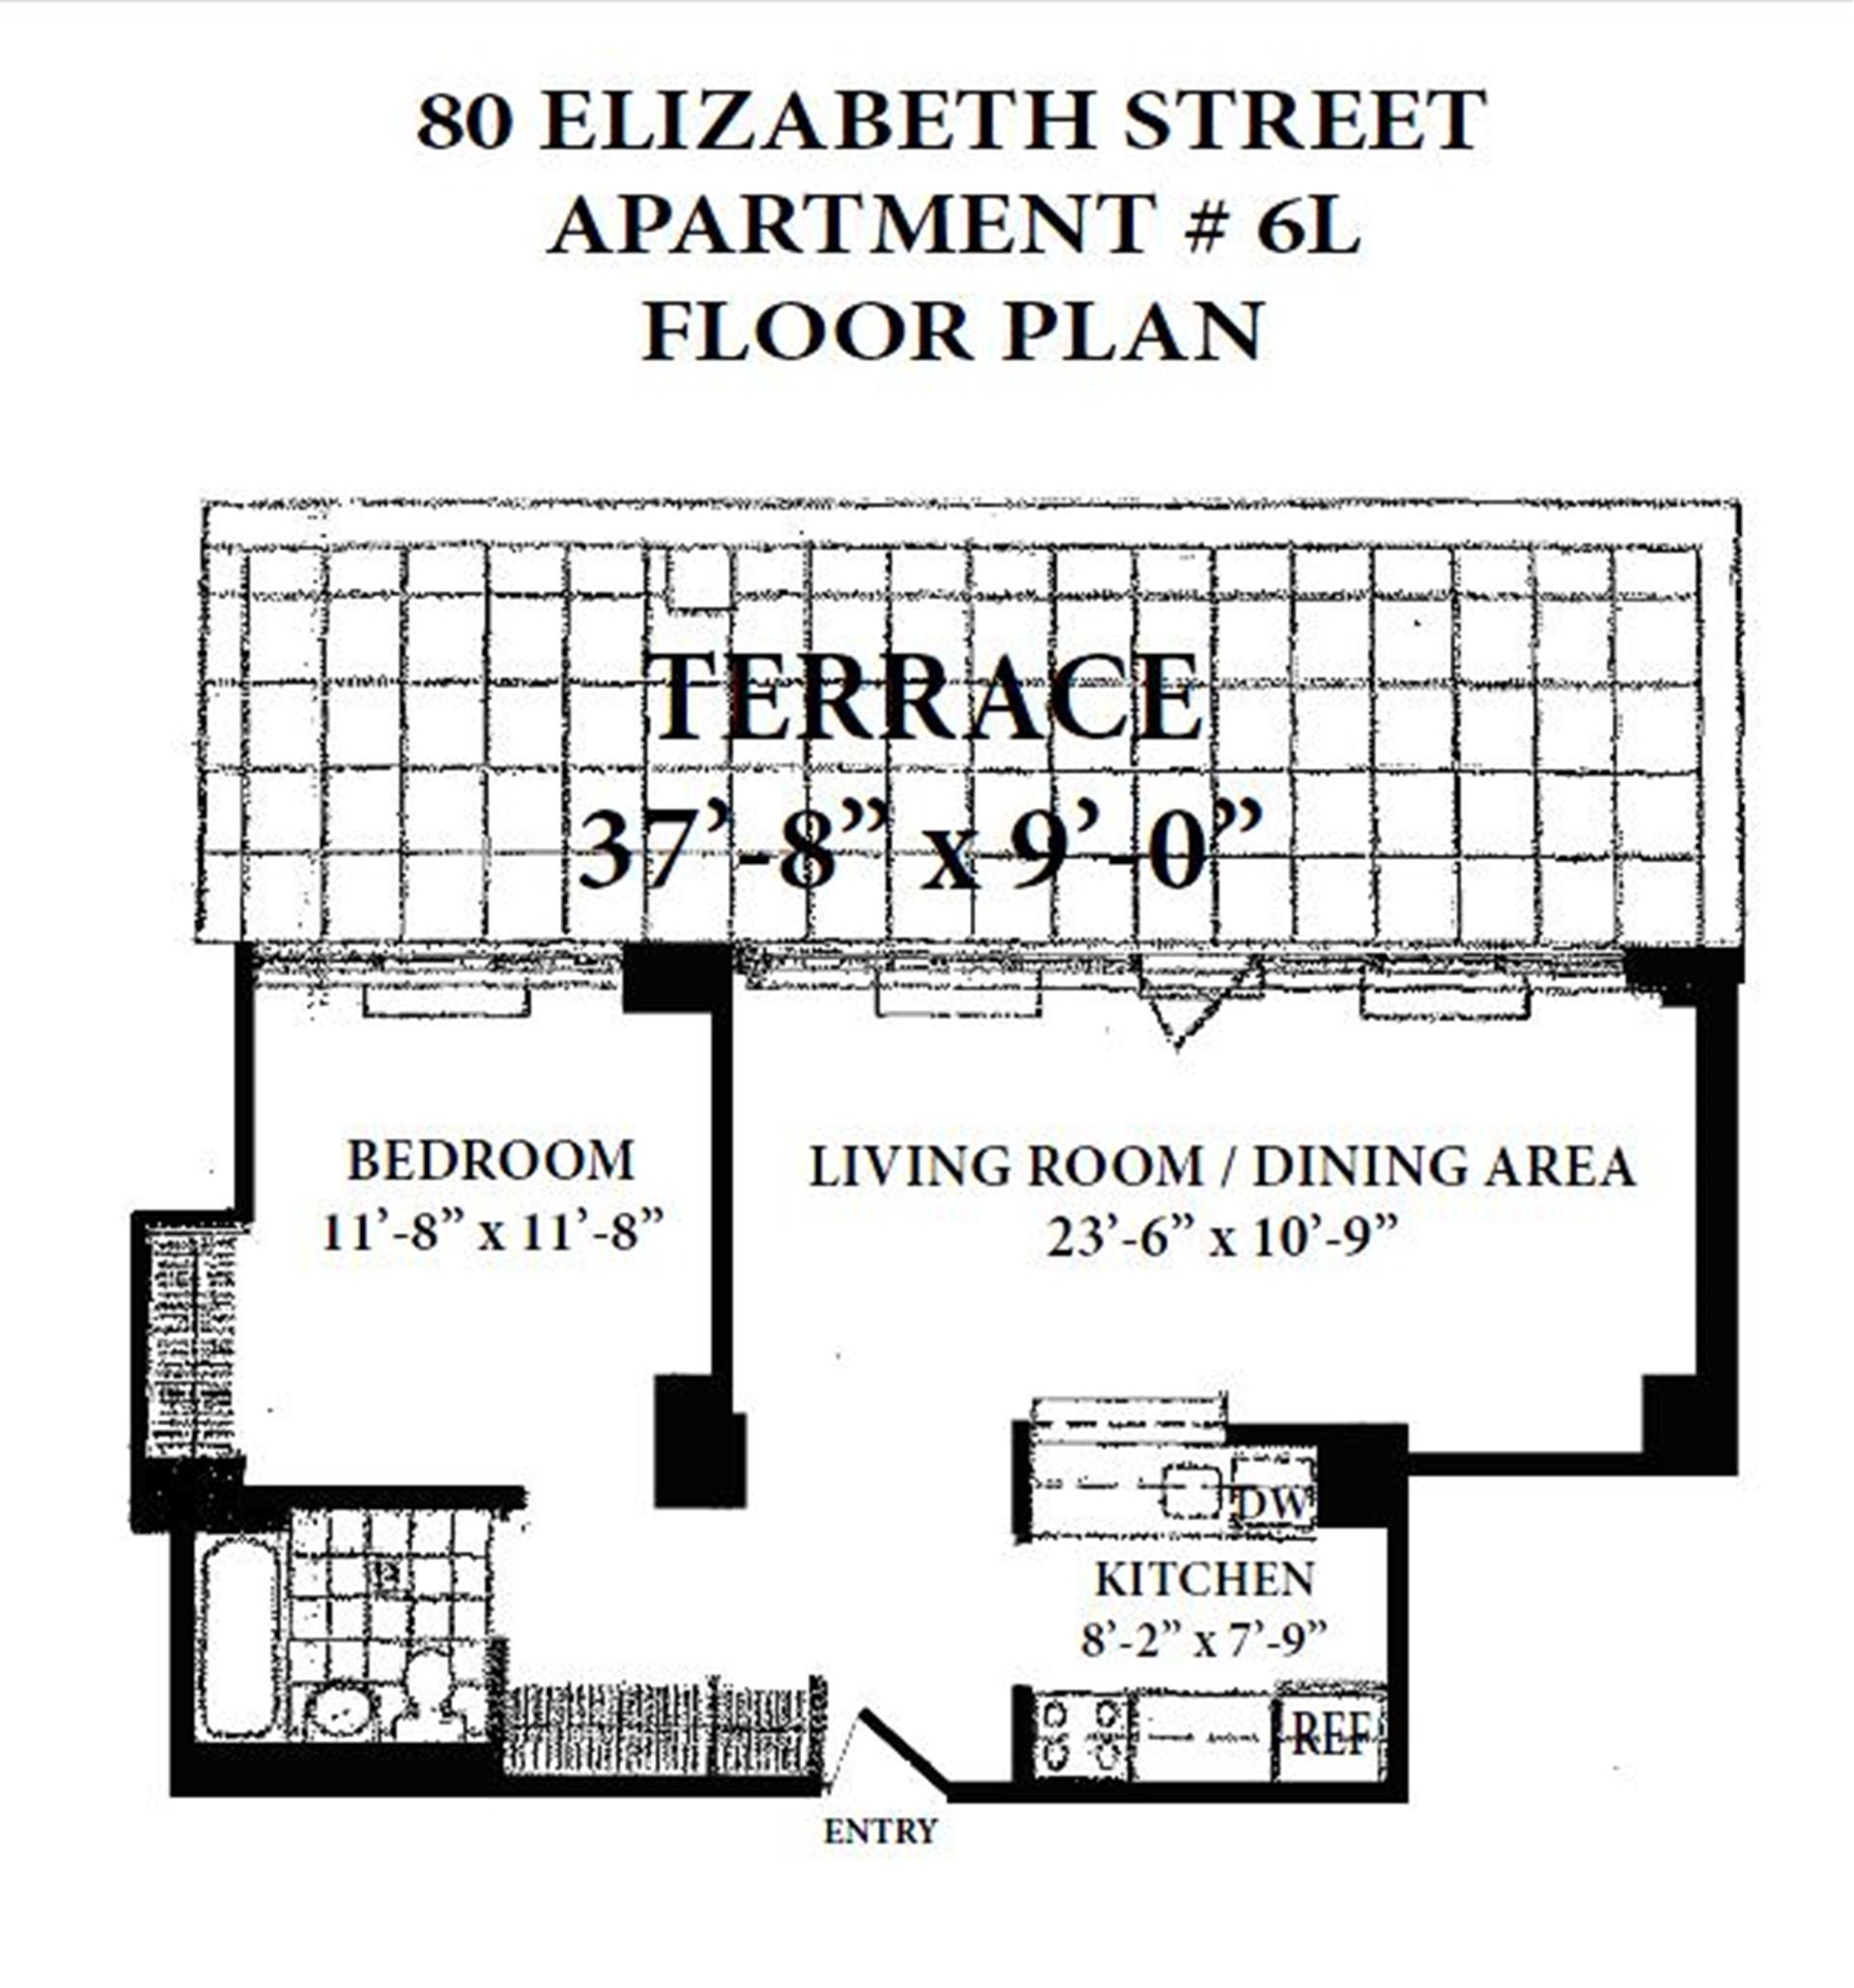 Floor plan of 80 Elizabeth St, 6L - Little Italy - Chinatown, New York